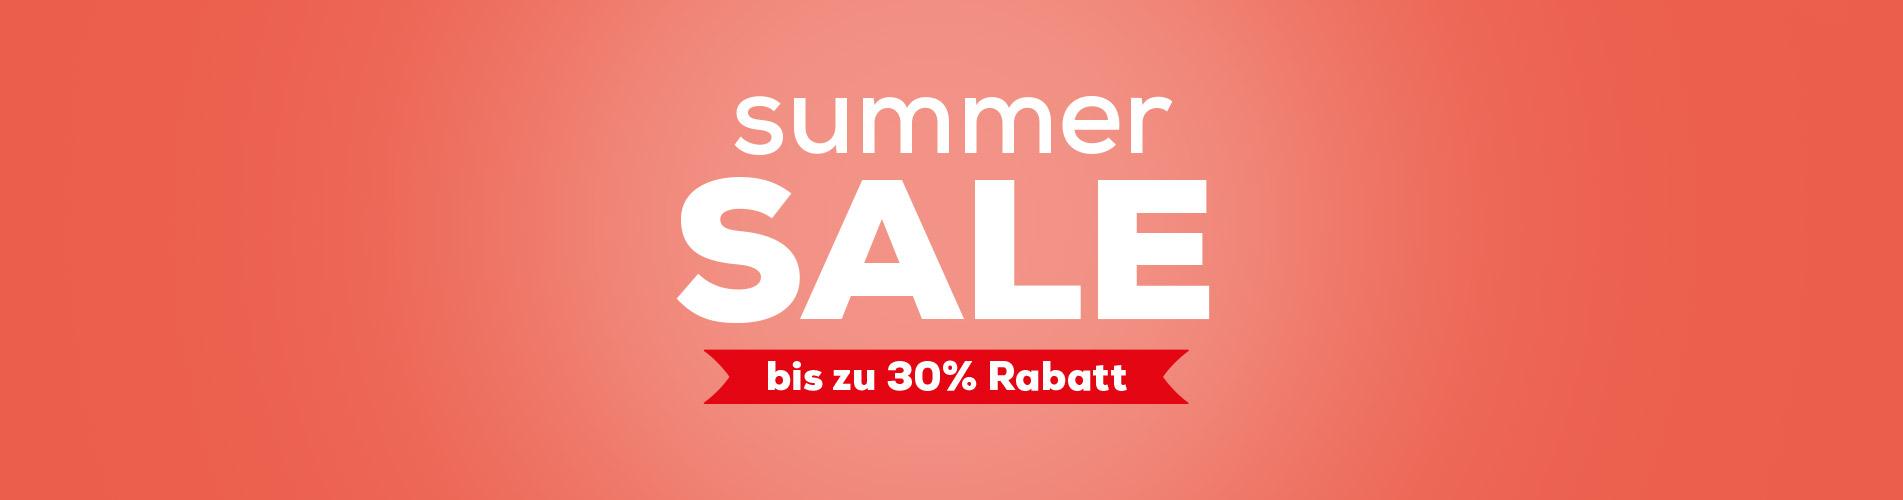 Summer Sale bei Swiss Sense |Bis zu 30% Rabatt